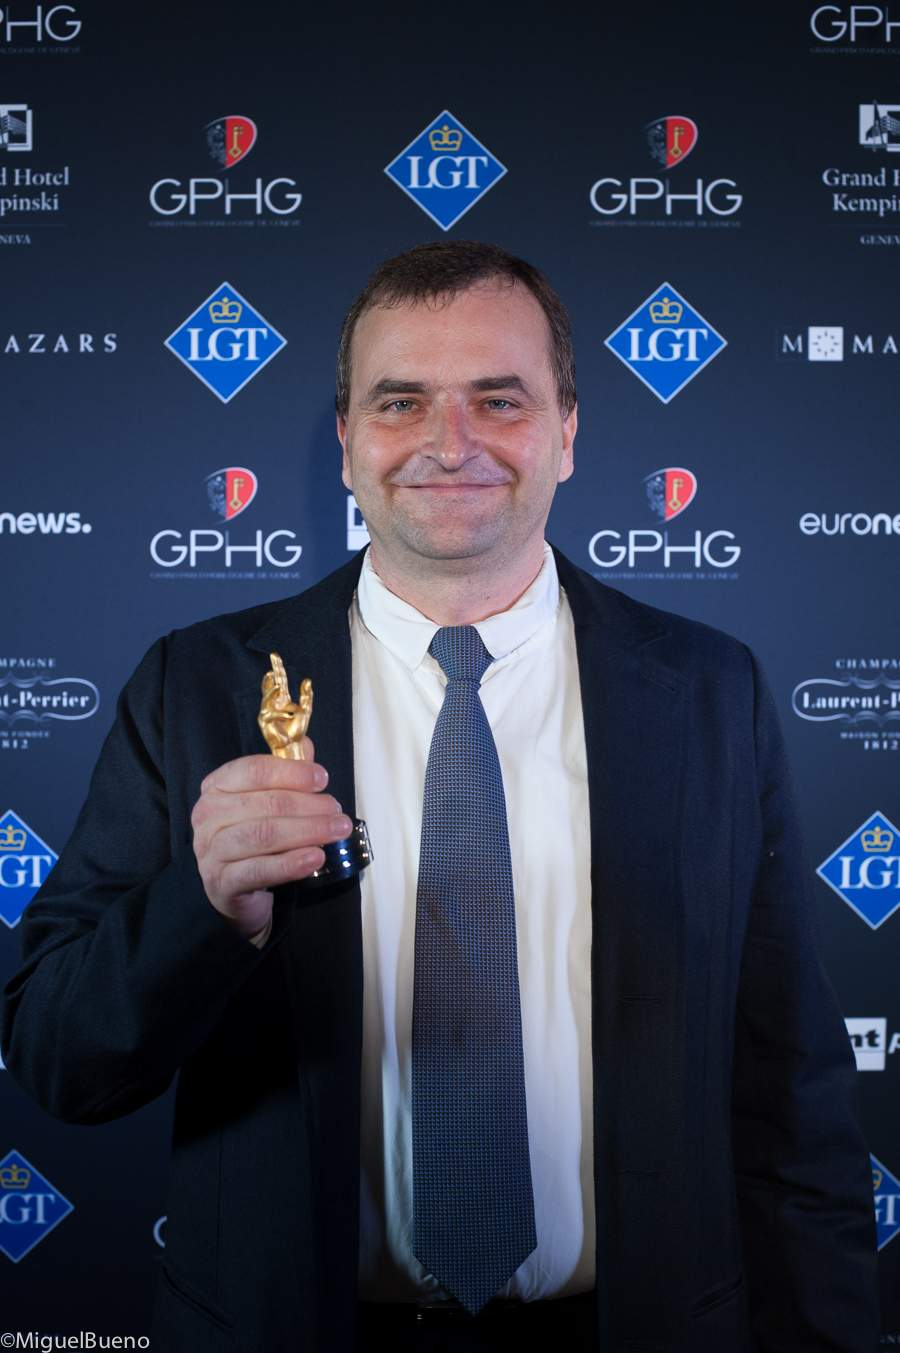 Uwe Ahrendt, CEO of Nomos Glashütte, winner of the Challenge Watch Prize 2018